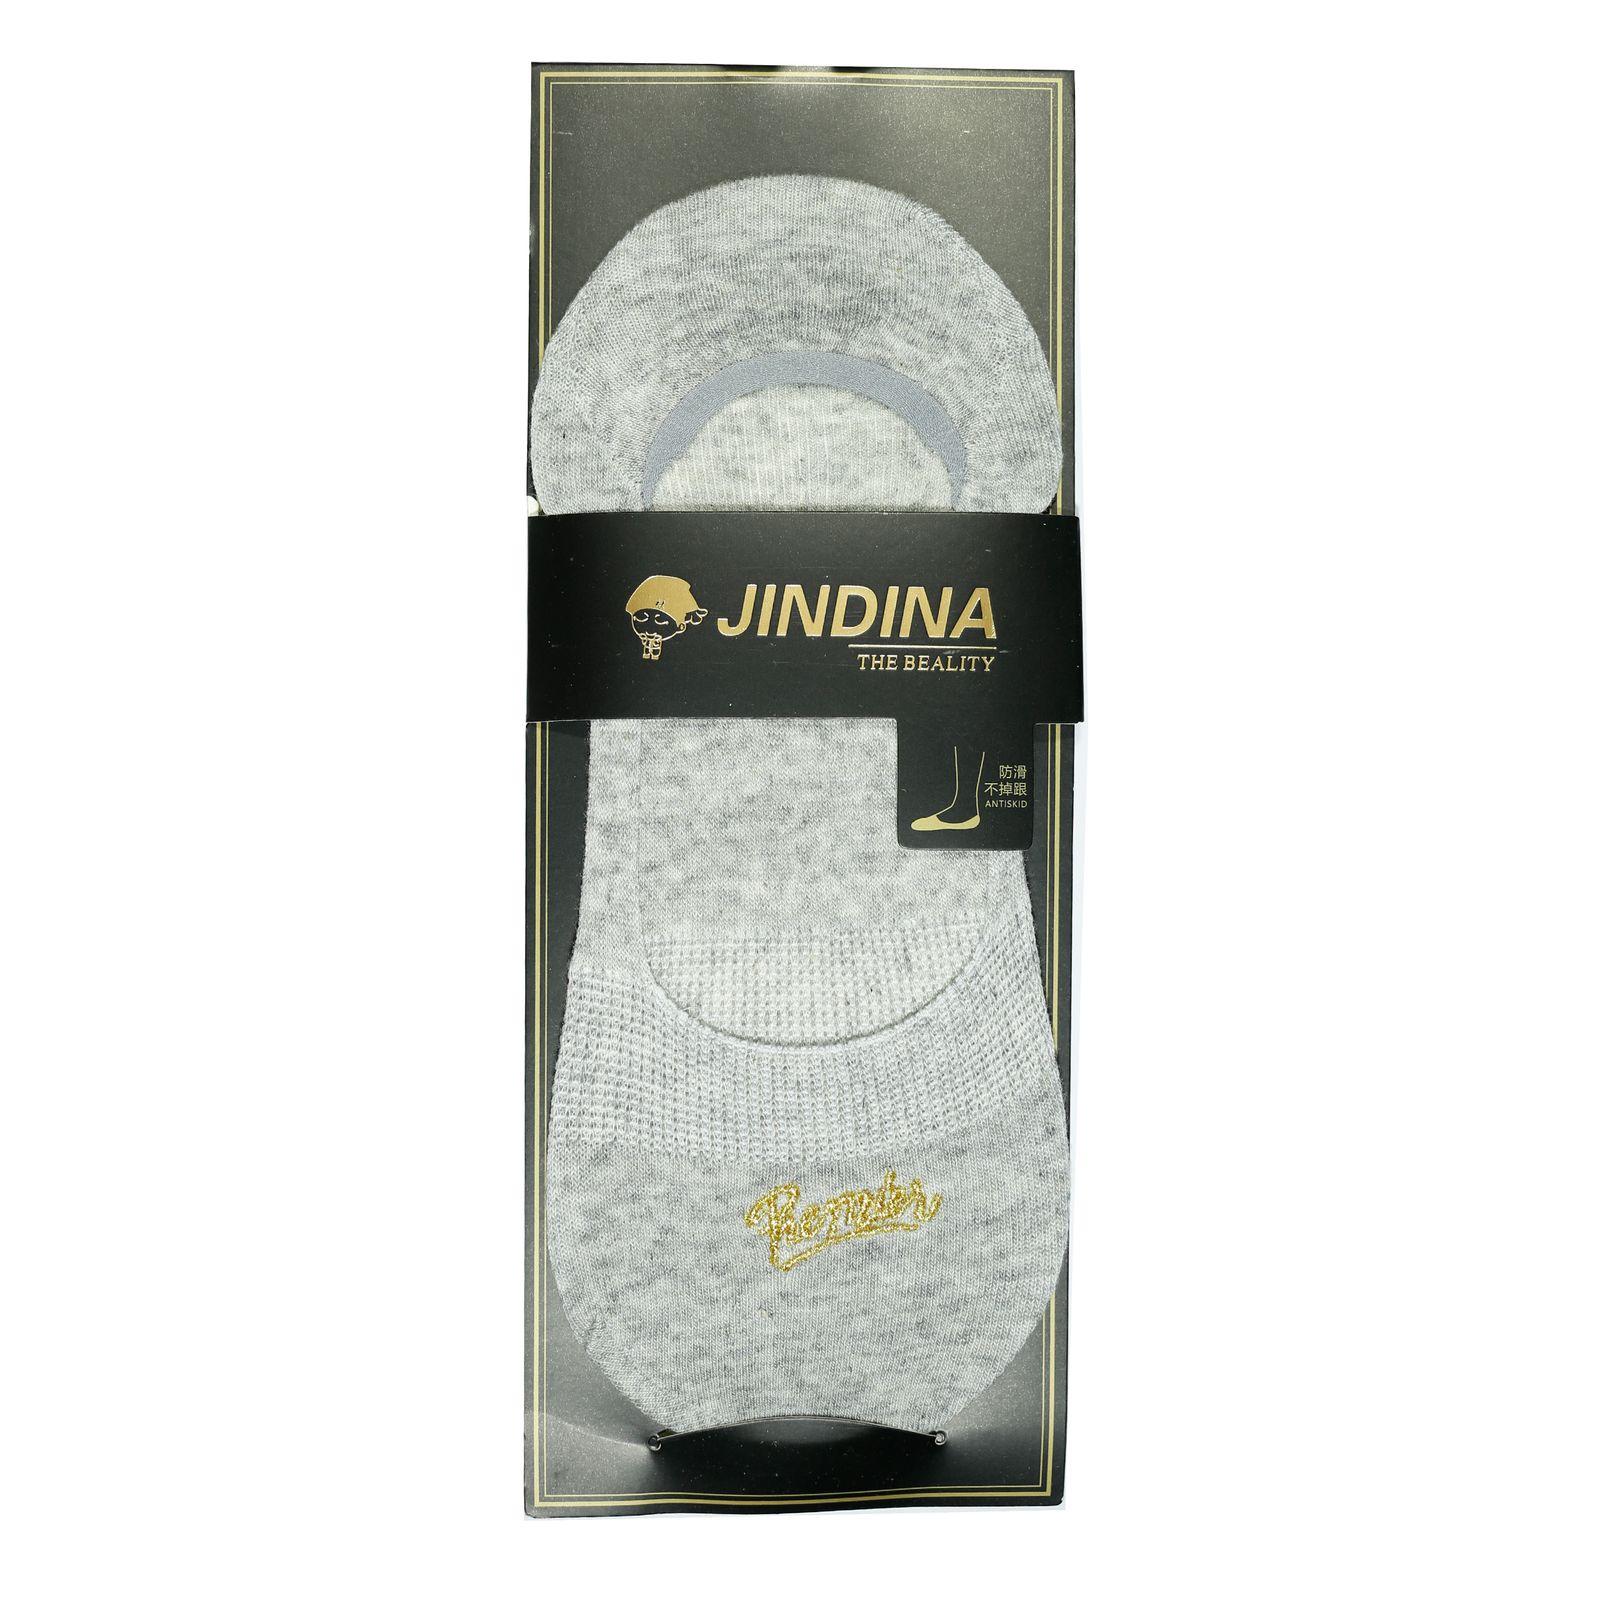 جوراب مردانه جین دینا کد 204 مجموعه 3 عددی -  - 4